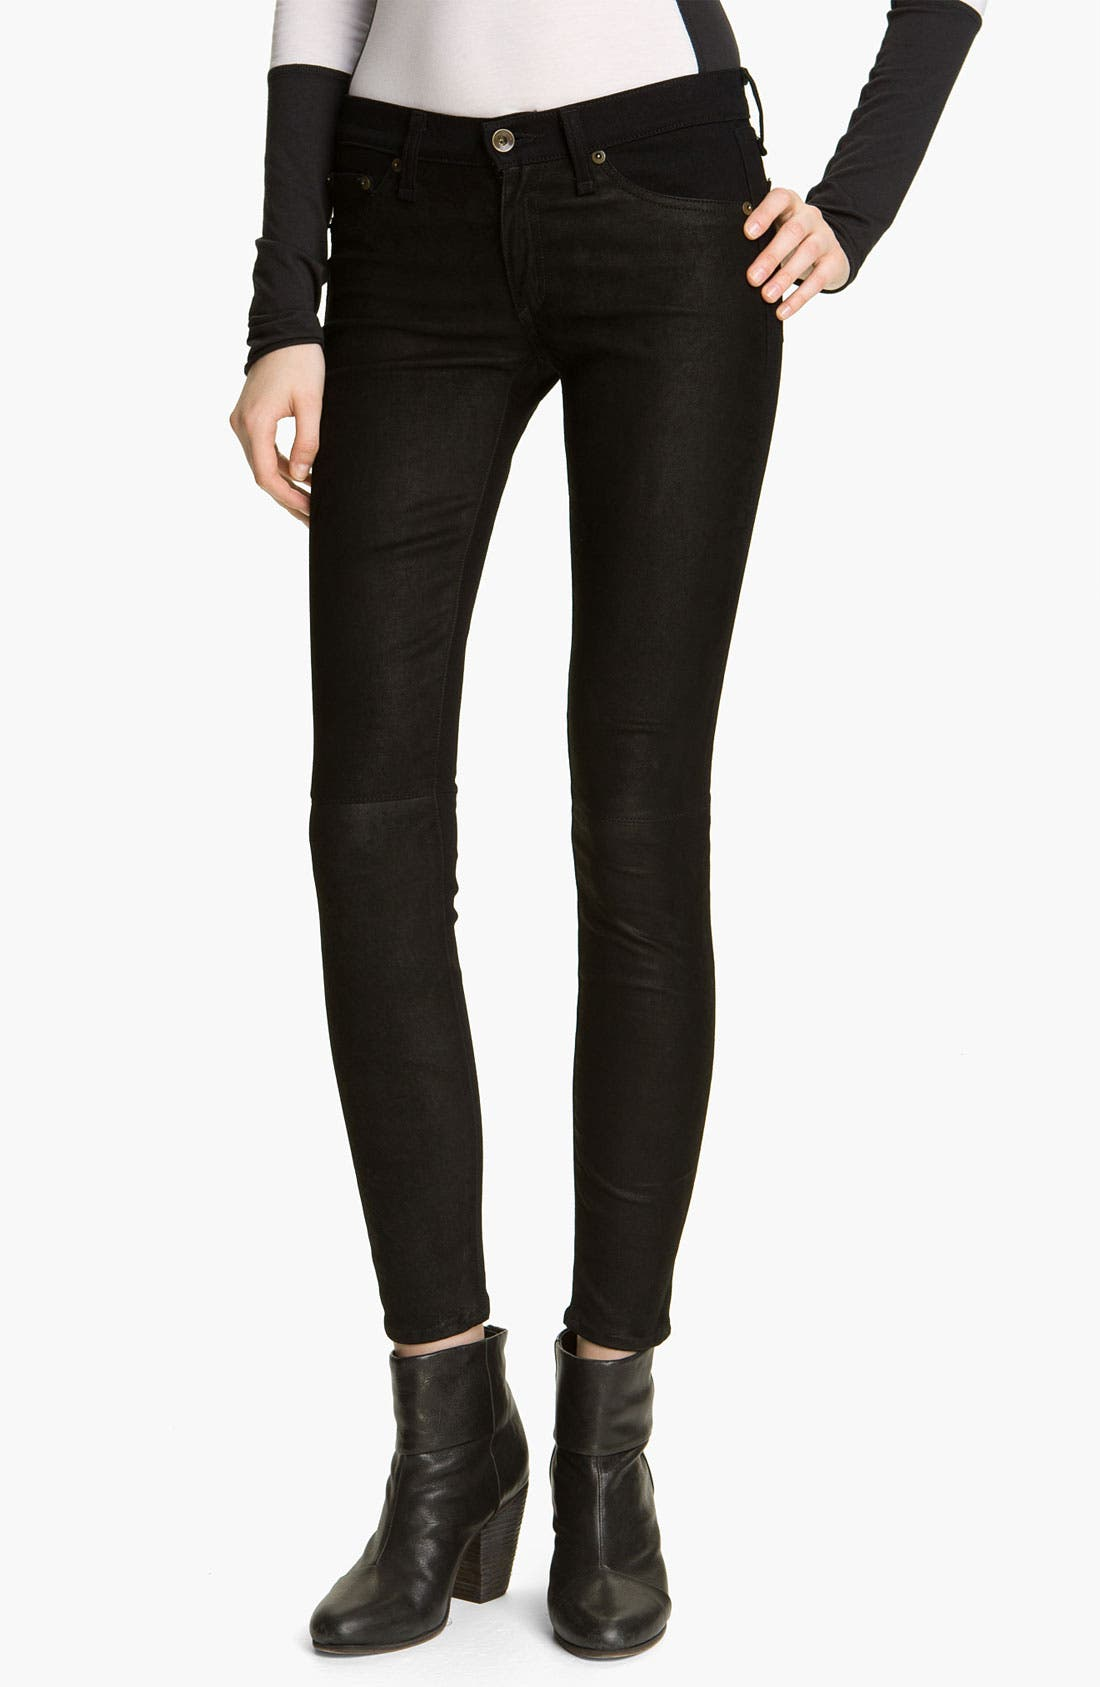 Alternate Image 1 Selected - rag & bone/JEAN Skinny Denim & Leather Jeans